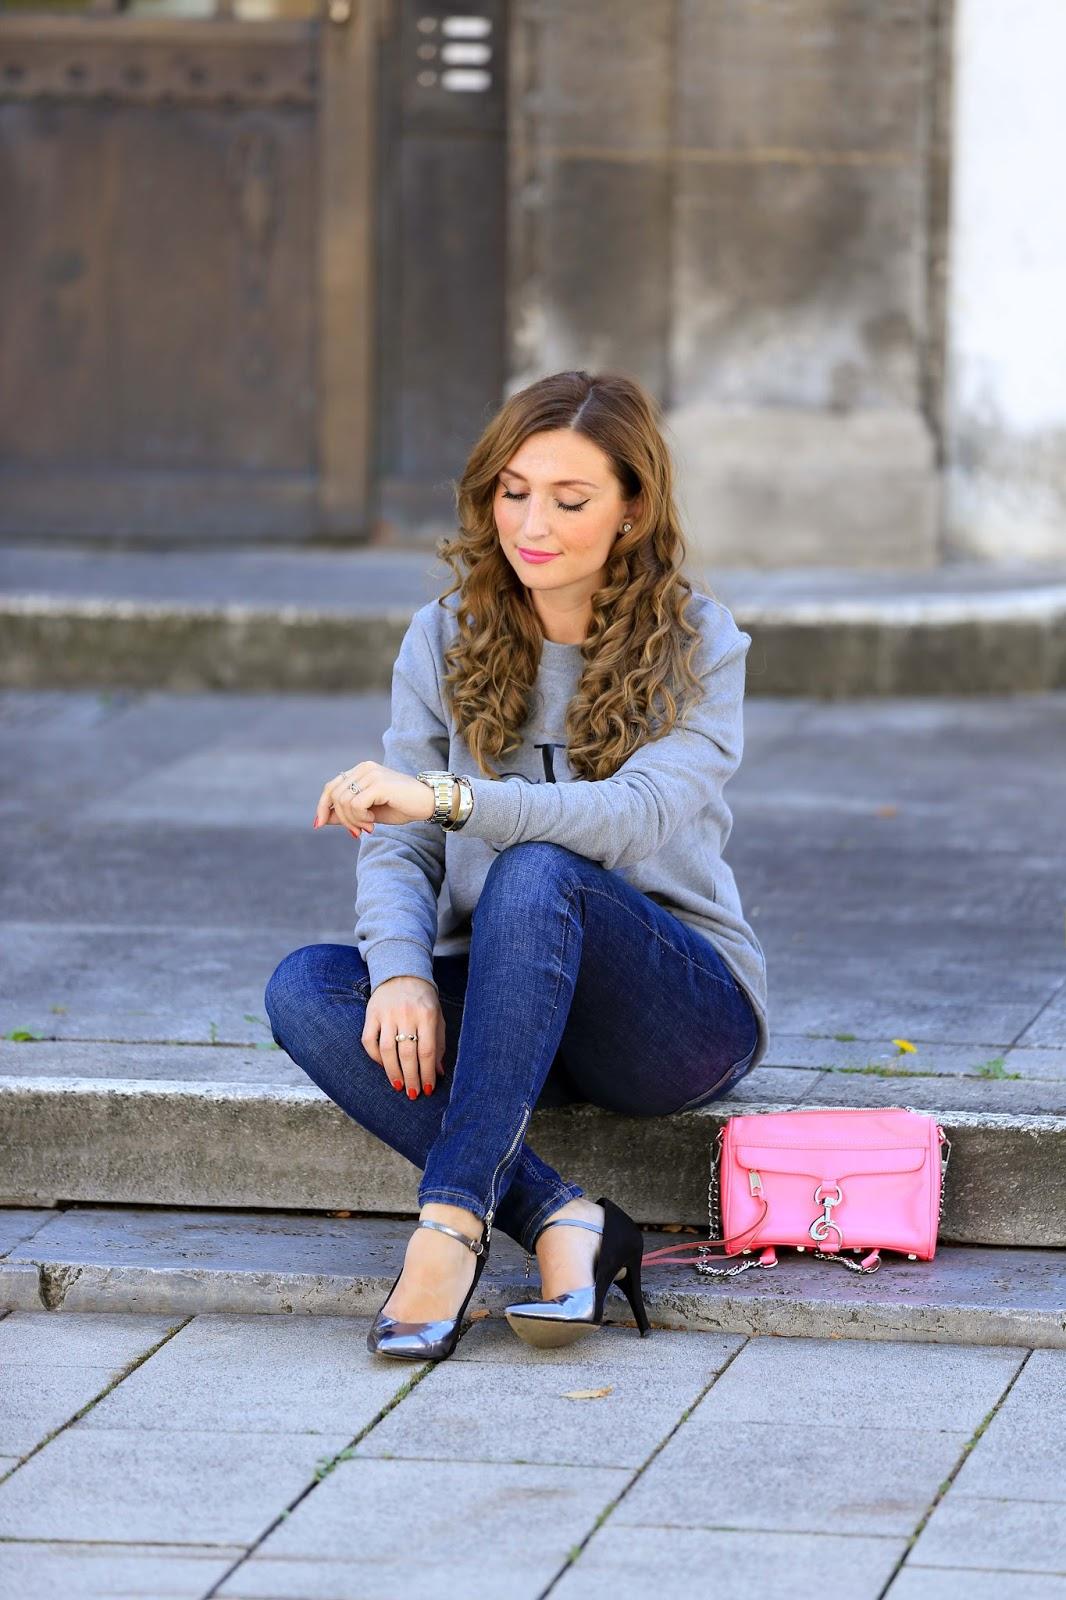 CK Pullover-grauer Pullover-pinke Tasche-Stella Mc Cartney Tasche-silberne Schuhe-Casual Streetstyle-Fashionstylebyjohanna-Blogger-Fashionblog-Outfit-Modeblog-München-deutsche-Fashionblogger-Influencer